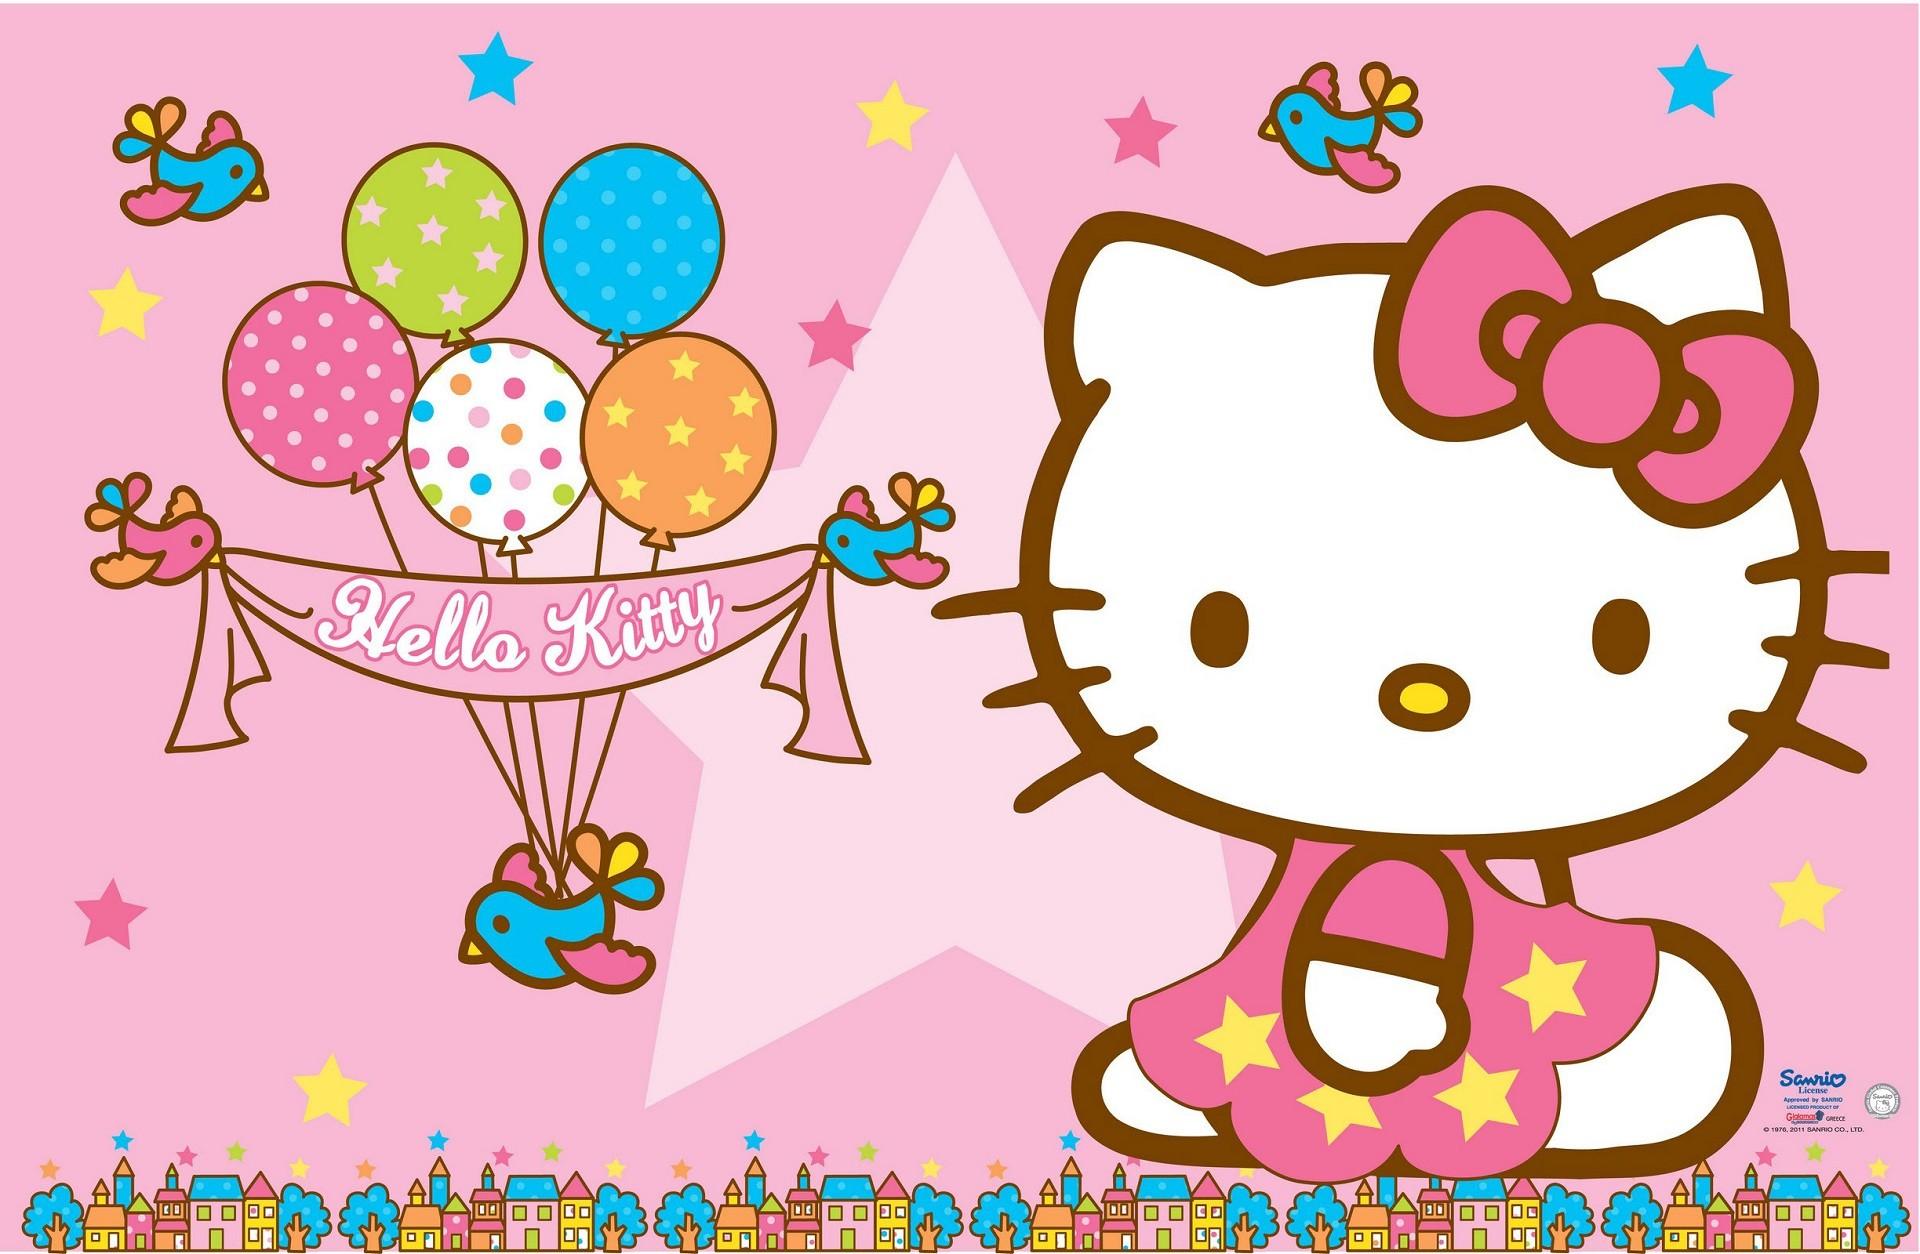 Wallpaper hello kitty wallpapertag - Wallpaper hello kitty full hd ...